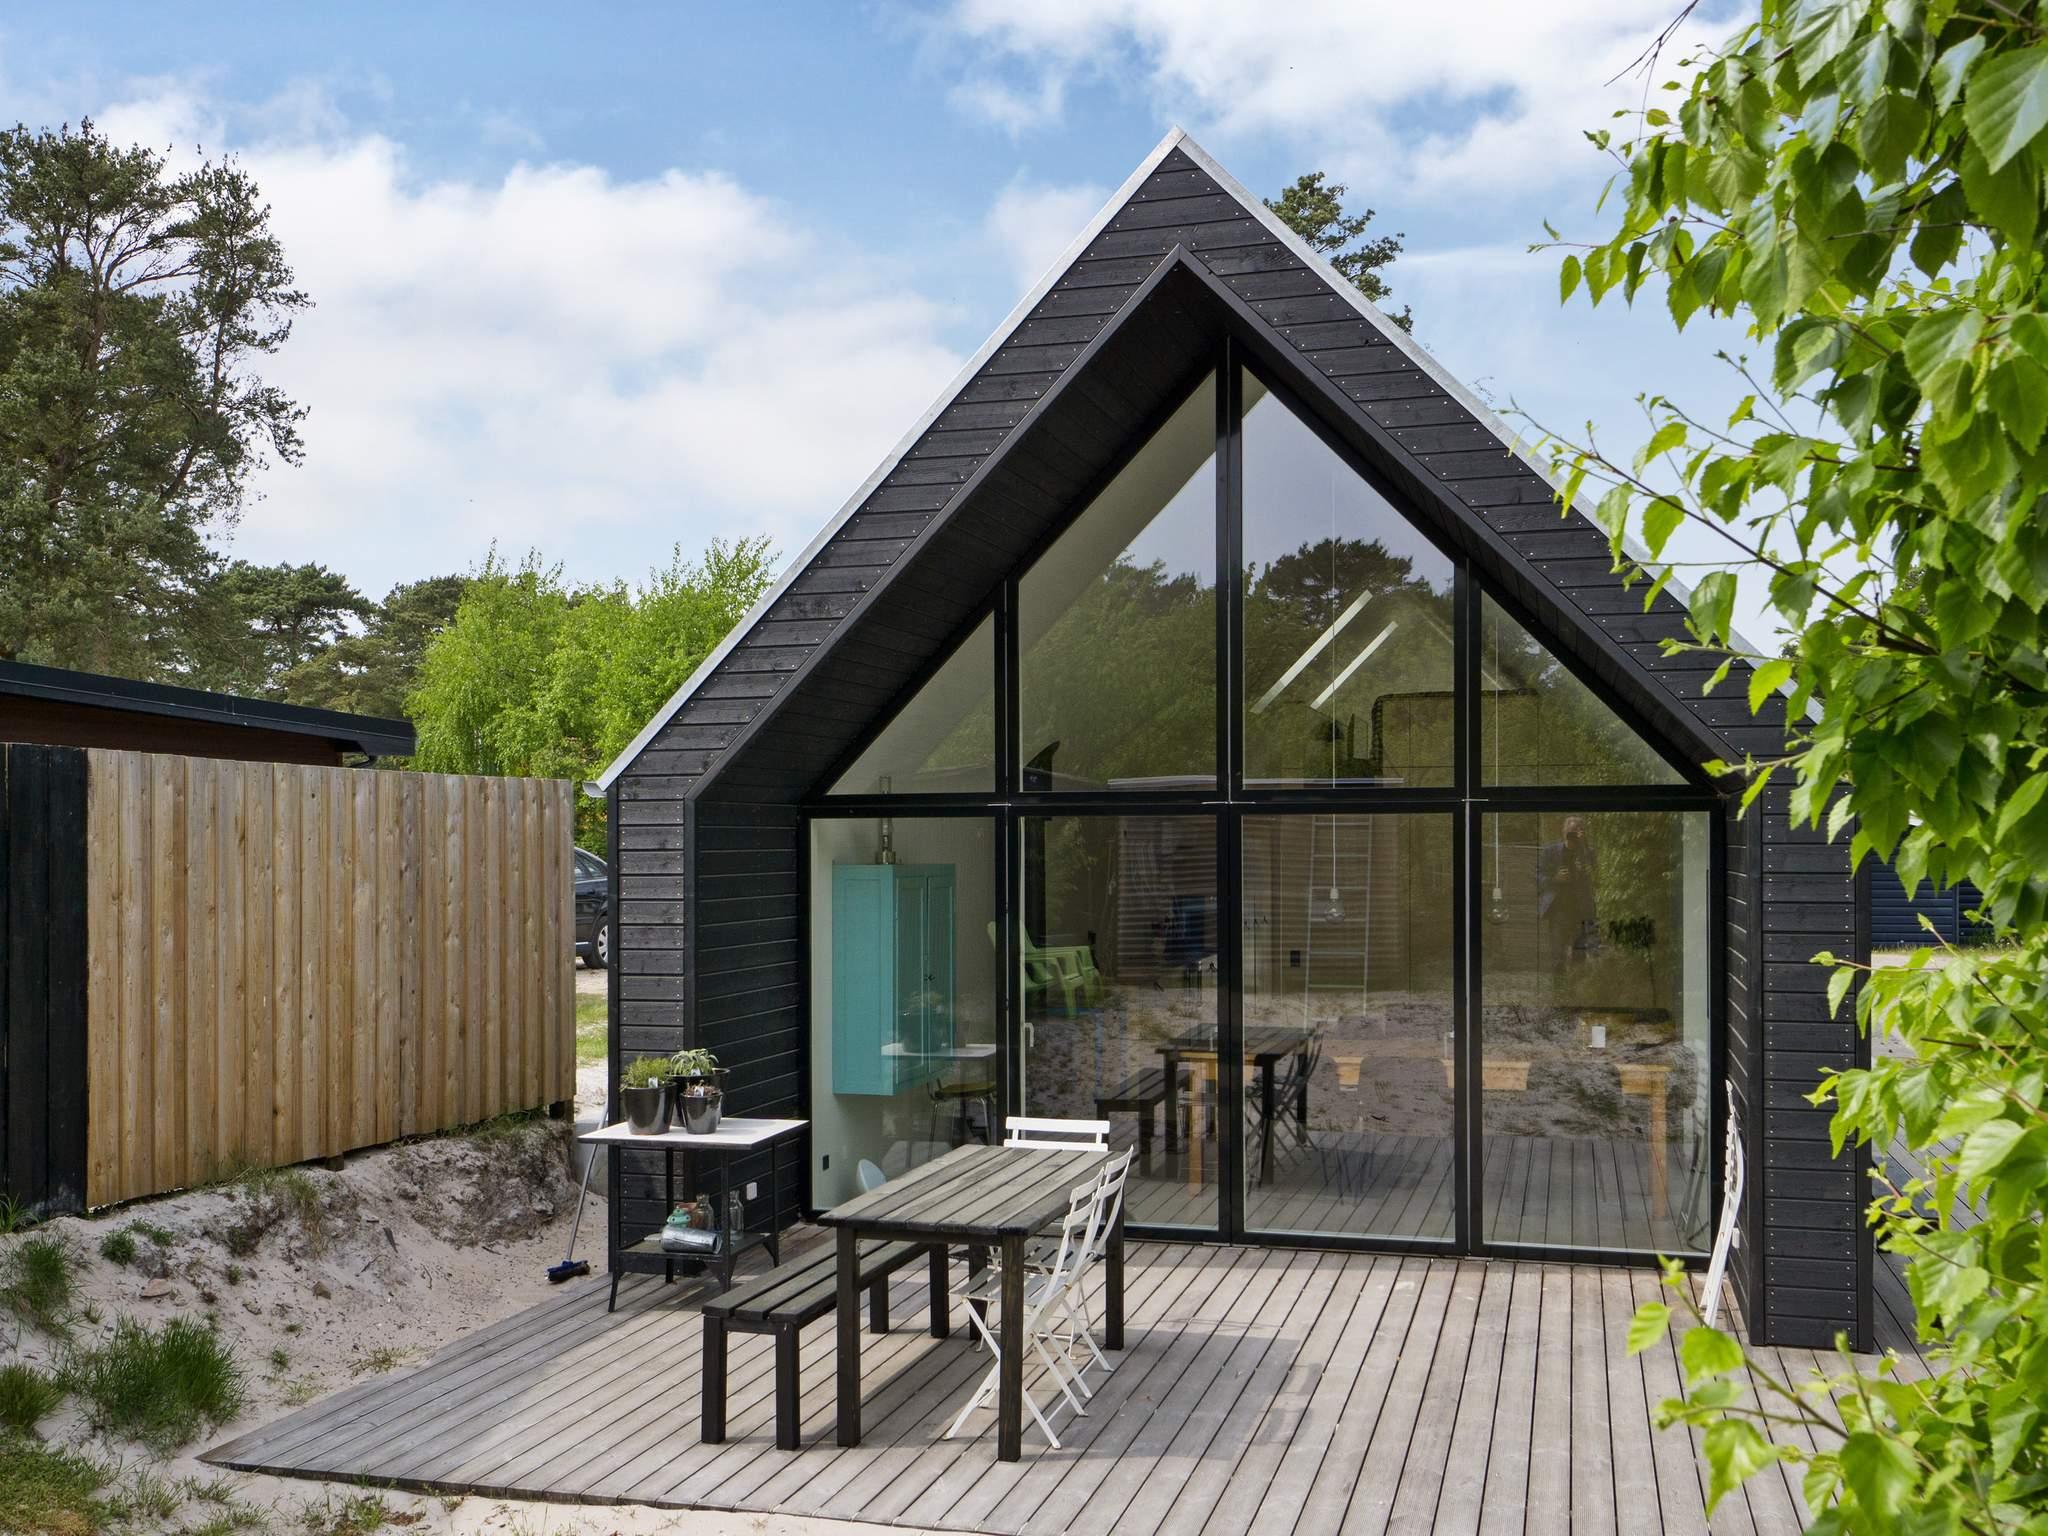 Ferienhaus Balka Strand (2354119), Balke, , Bornholm, Dänemark, Bild 10